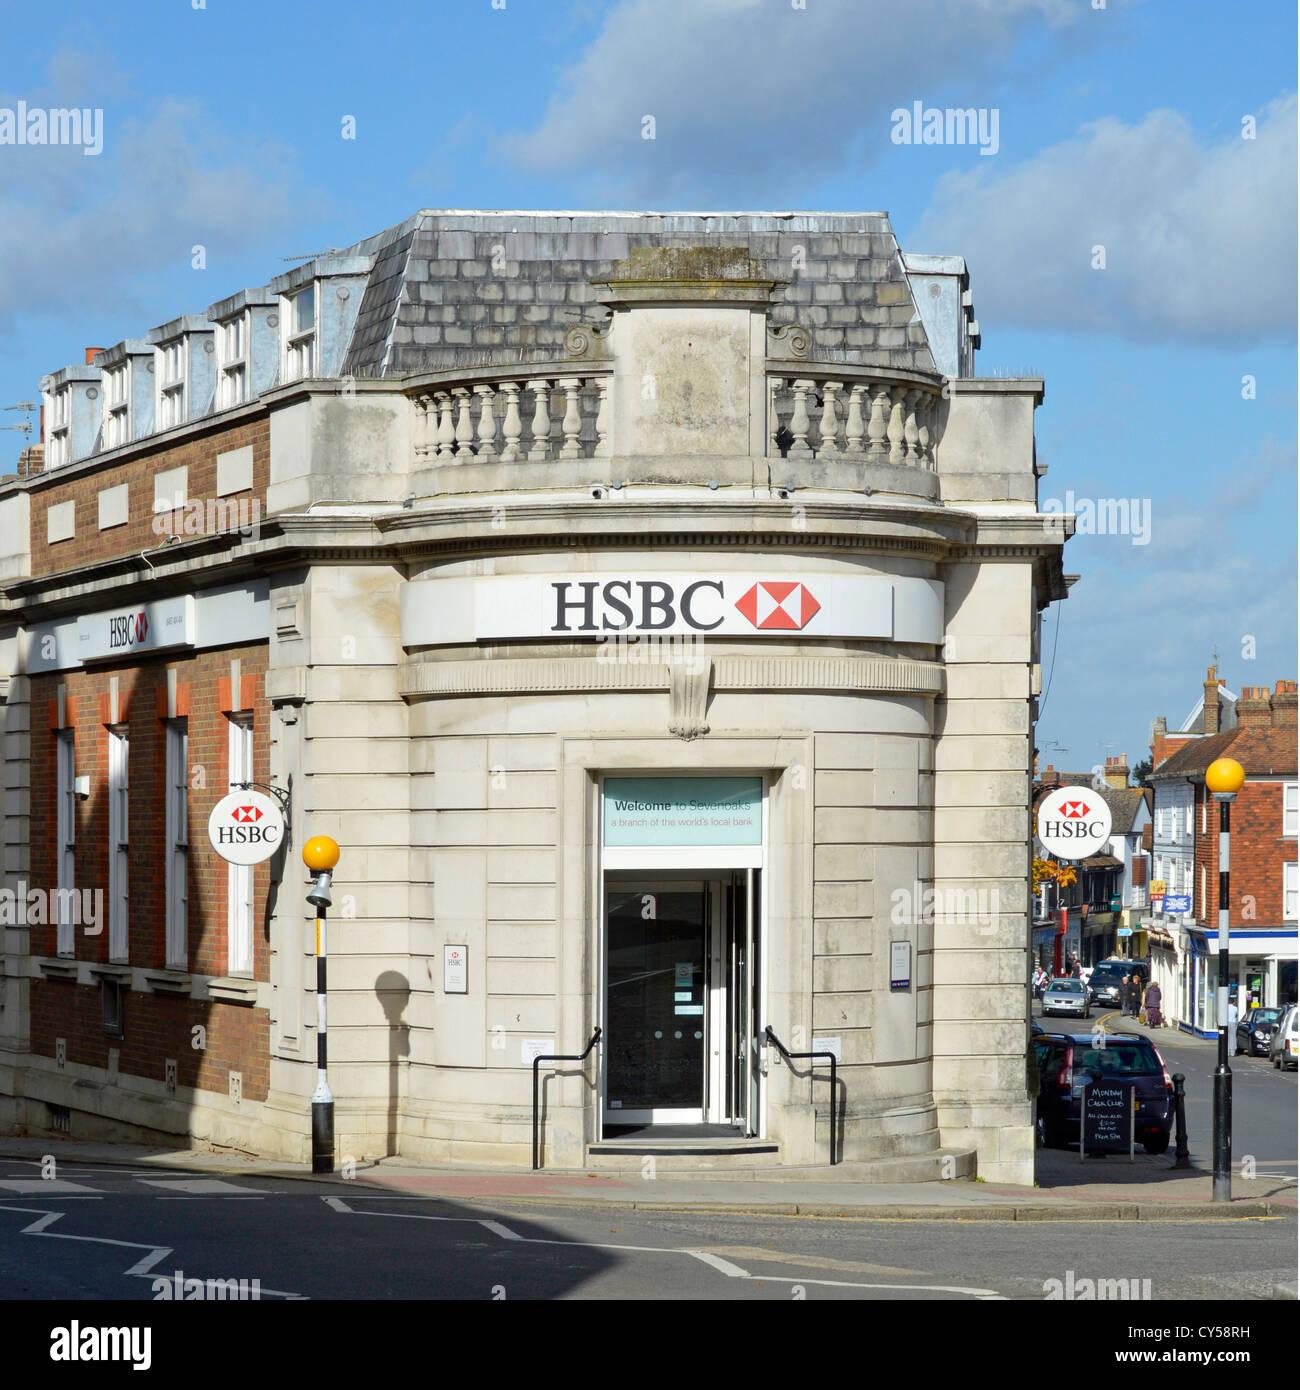 HSBC high street bank branch premises on corner site - Stock Image